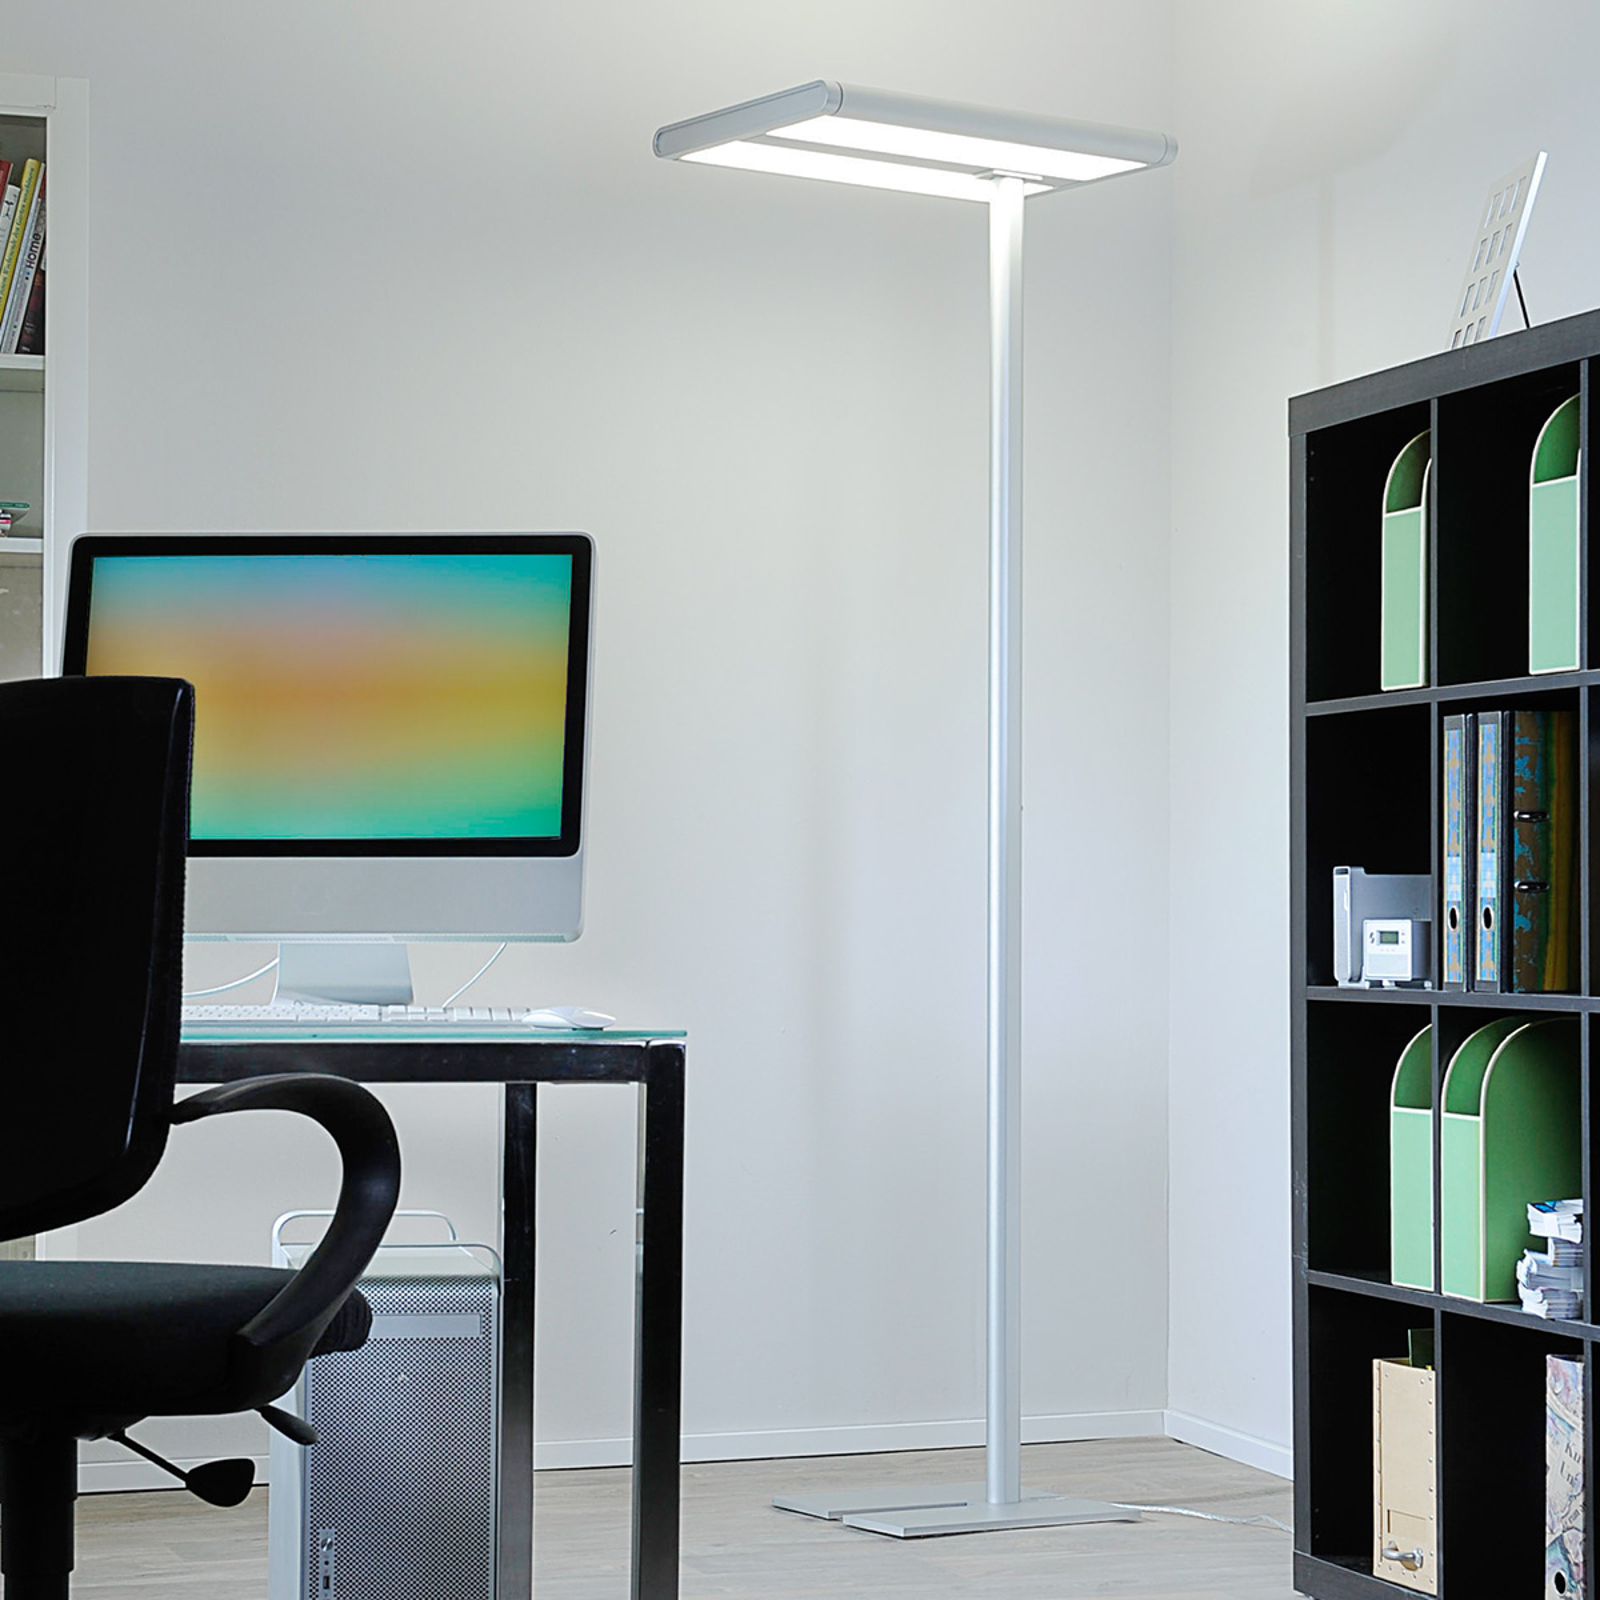 Lampa biurowa stojąca LED Quirin, 110W 4000K